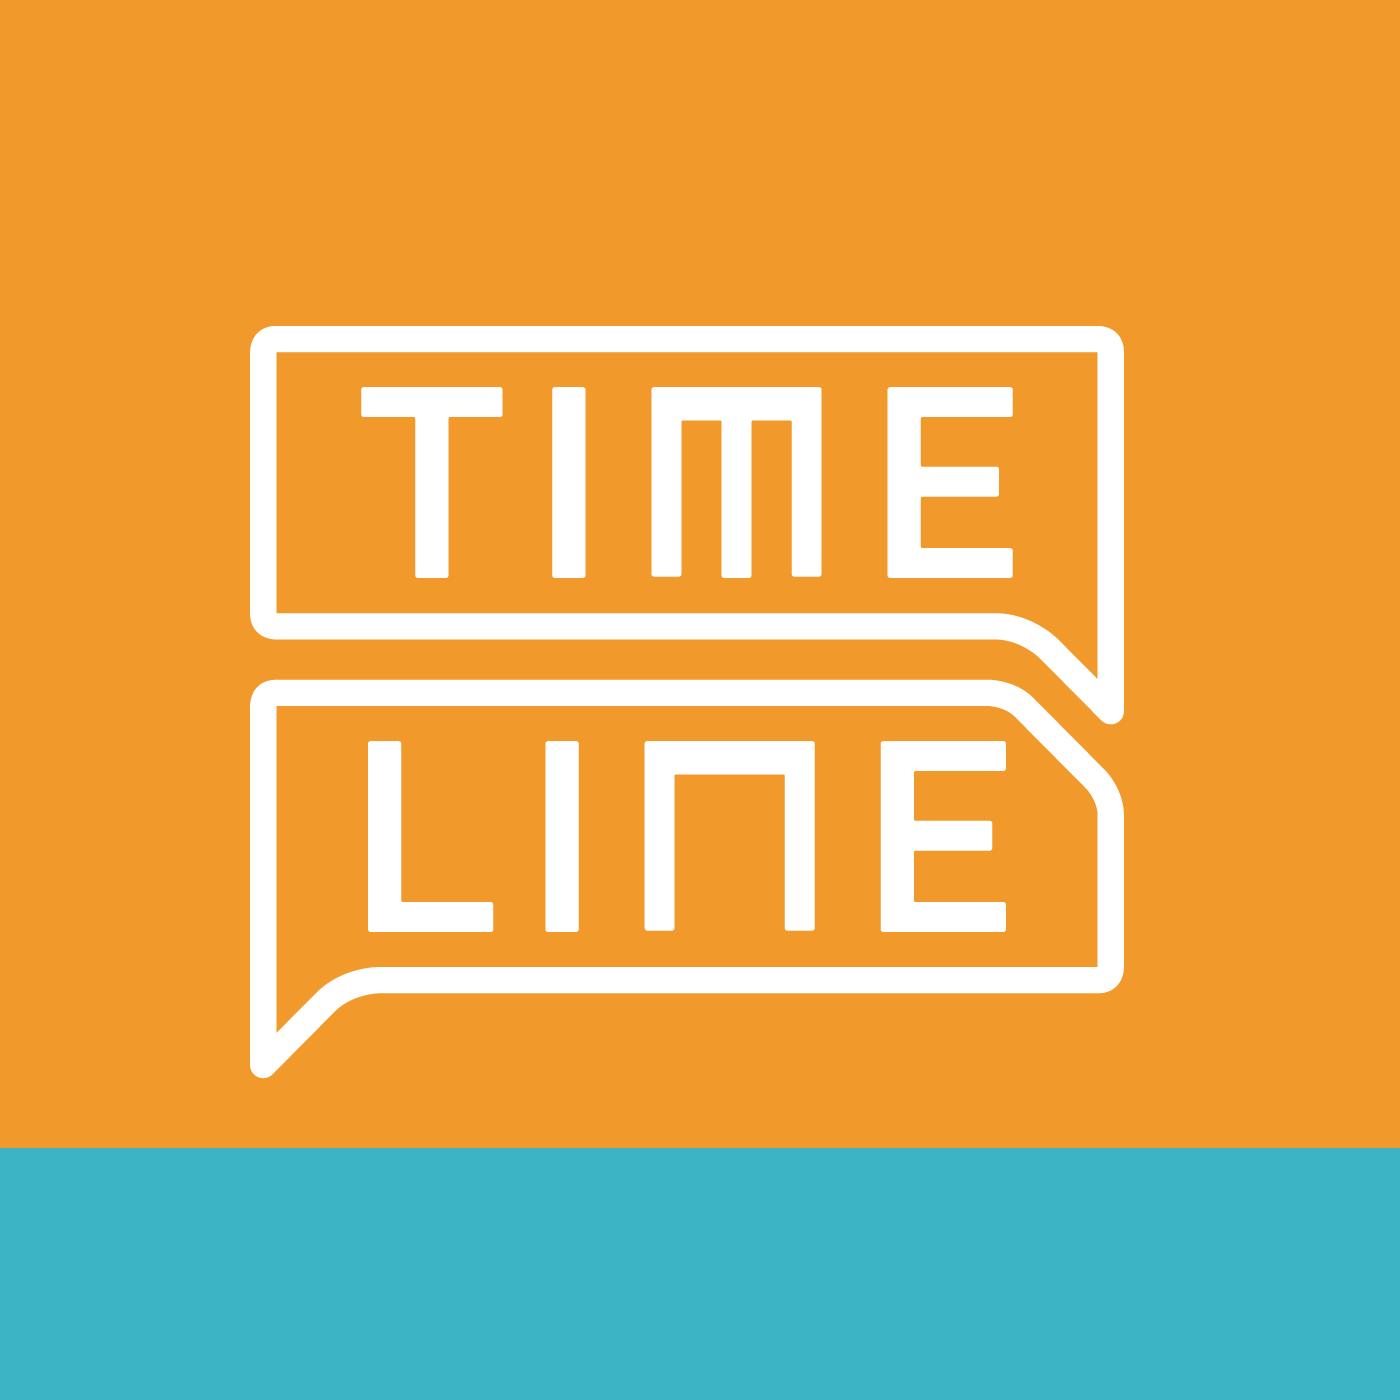 Timeline Gaúcha 19/01/2018